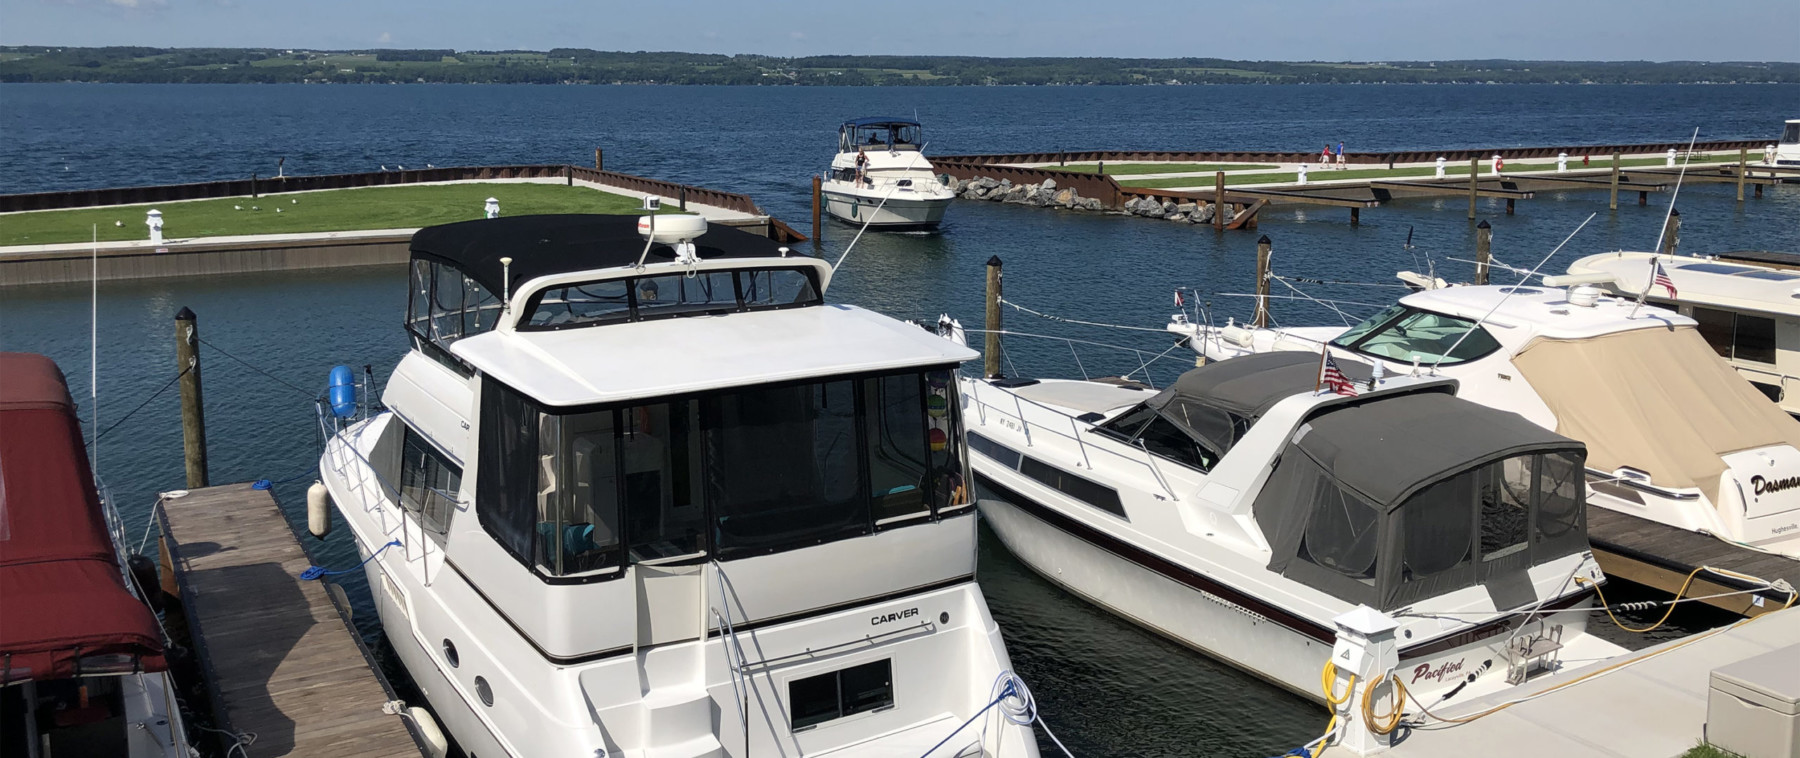 Samsen Marina Seneca Lake Boat Entrance 9320